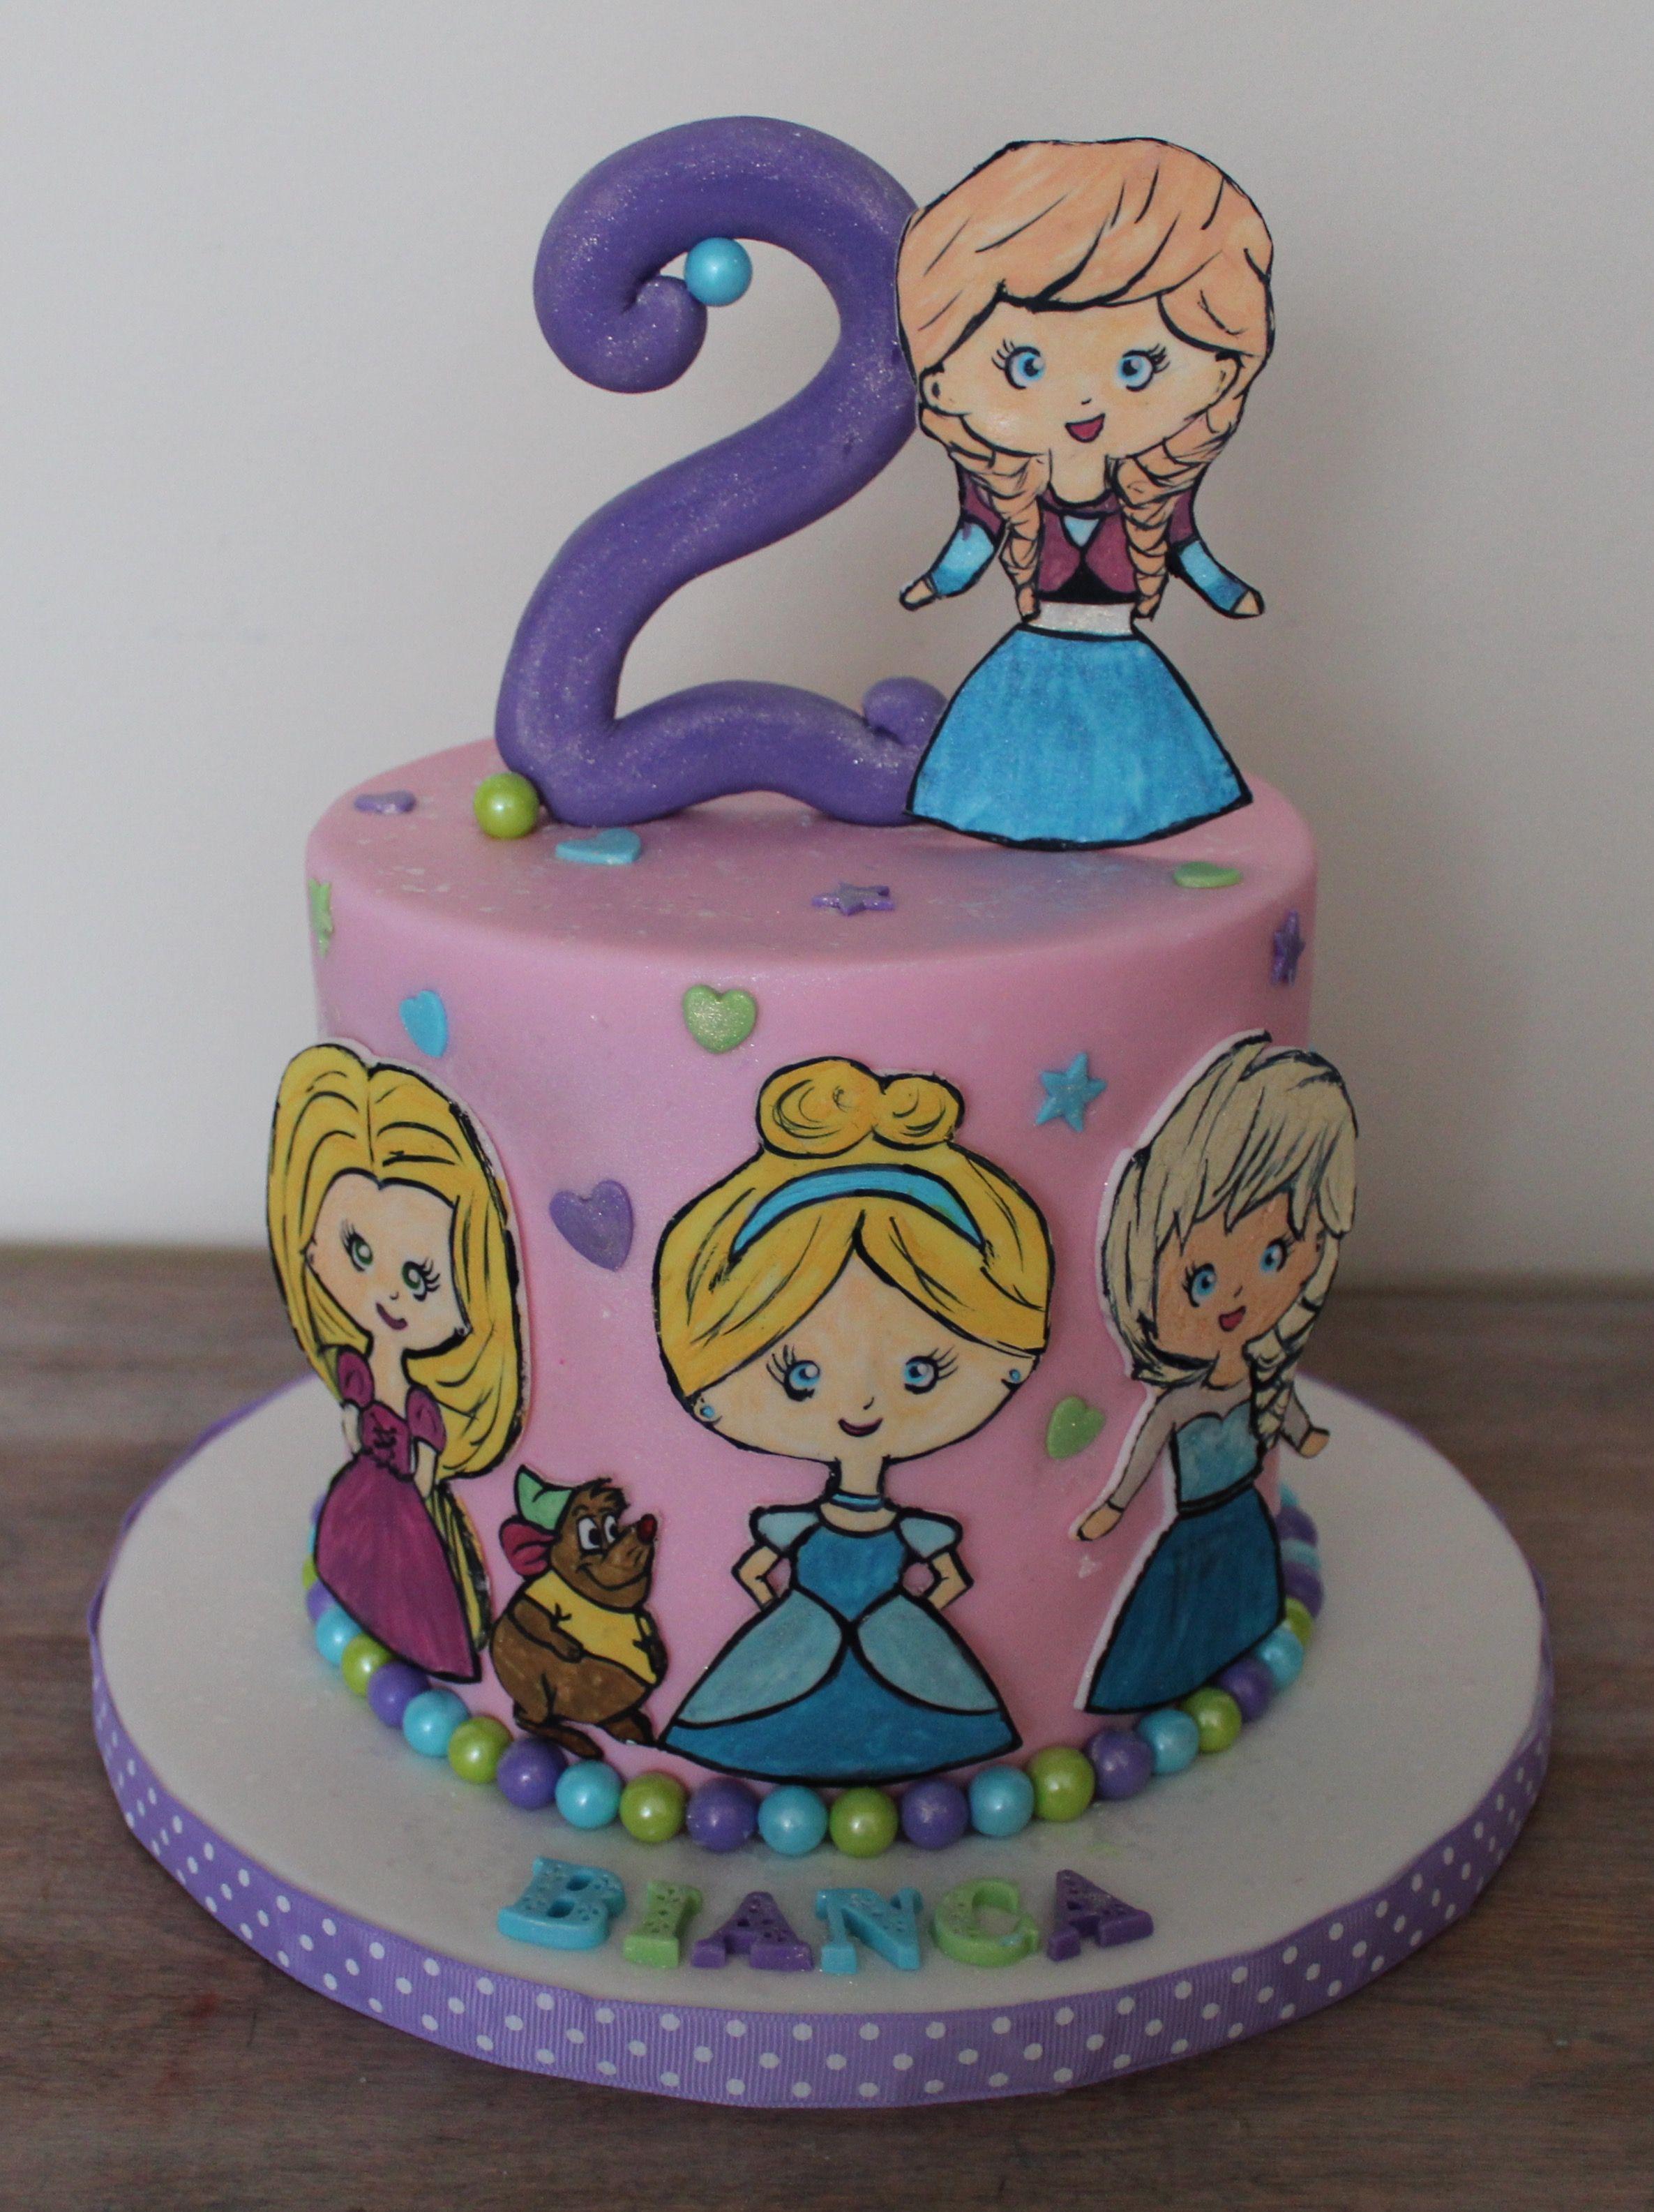 Princess Disney birthday cake cartoon fondant figurine anna elsa